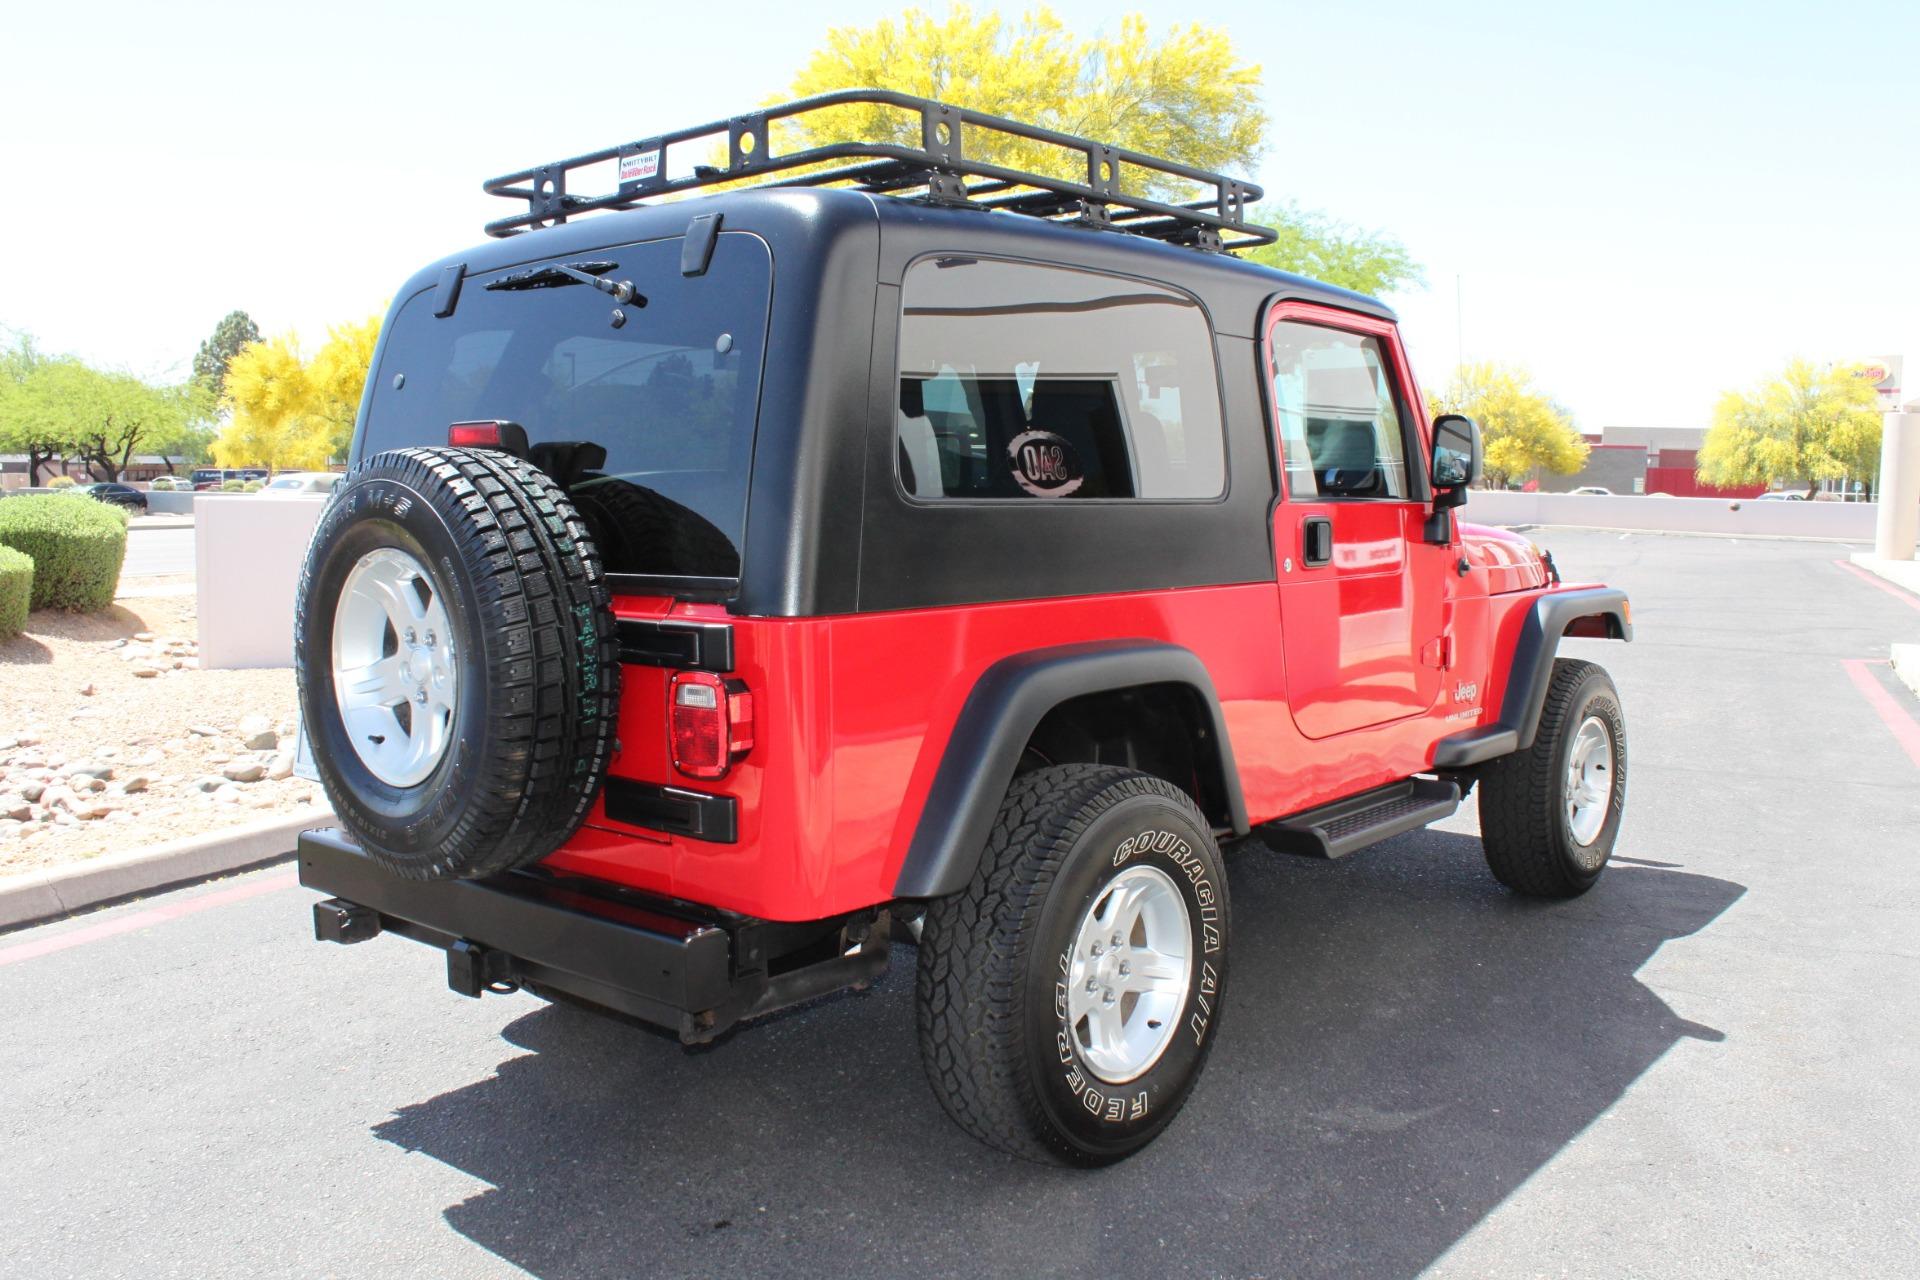 Used-2006-Jeep-Wrangler-4X4-LJ-Unlimited-LWB-Classic